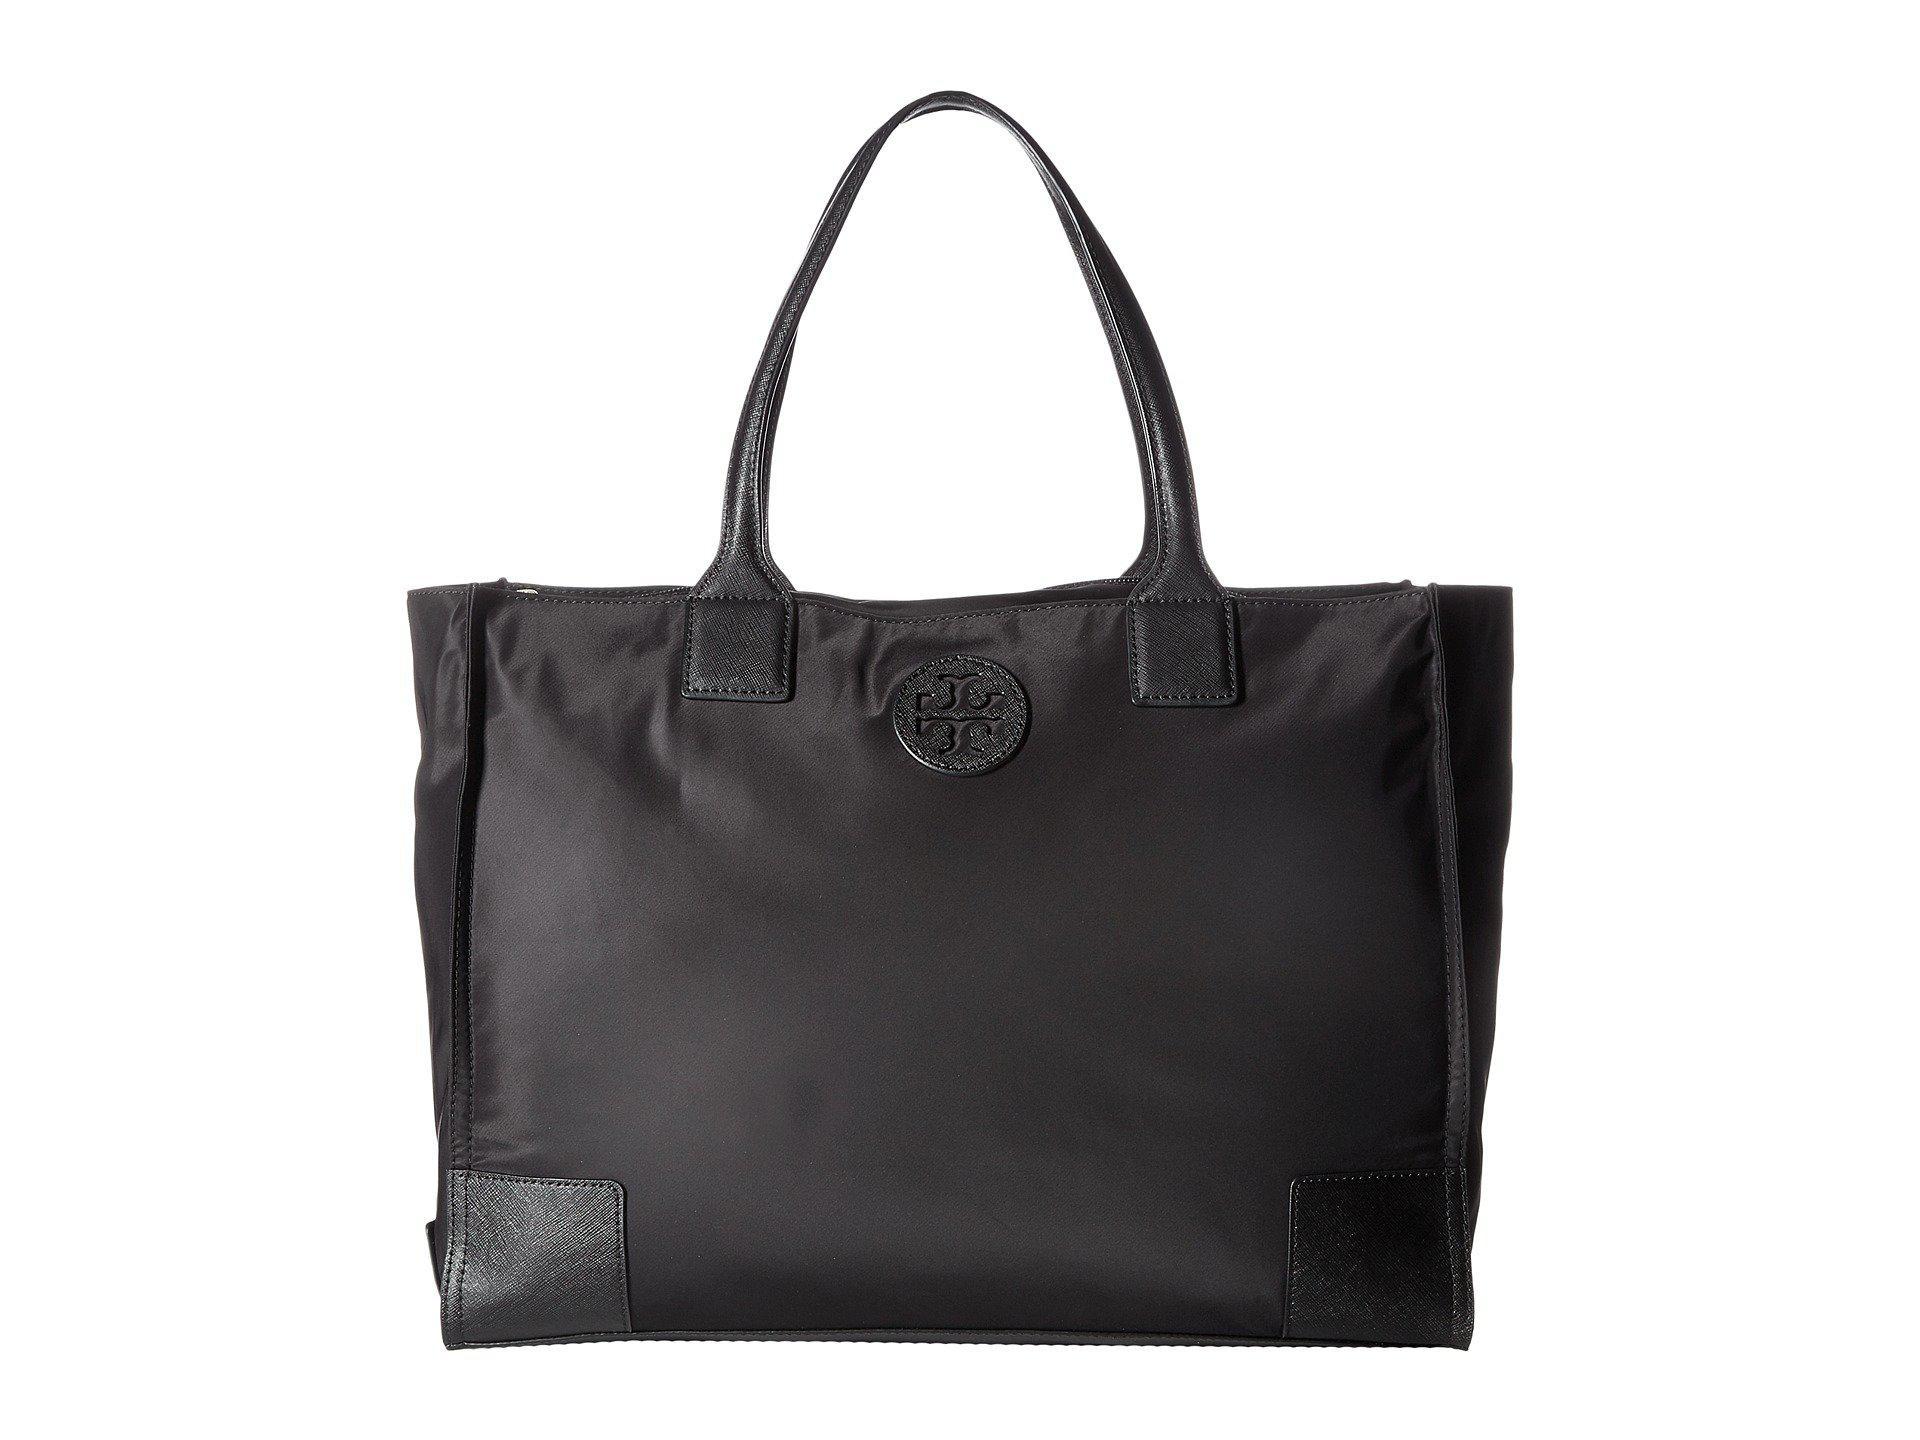 9f2e66e4b98 Lyst - Tory Burch Ella Packable Tote (black) Tote Handbags in Black